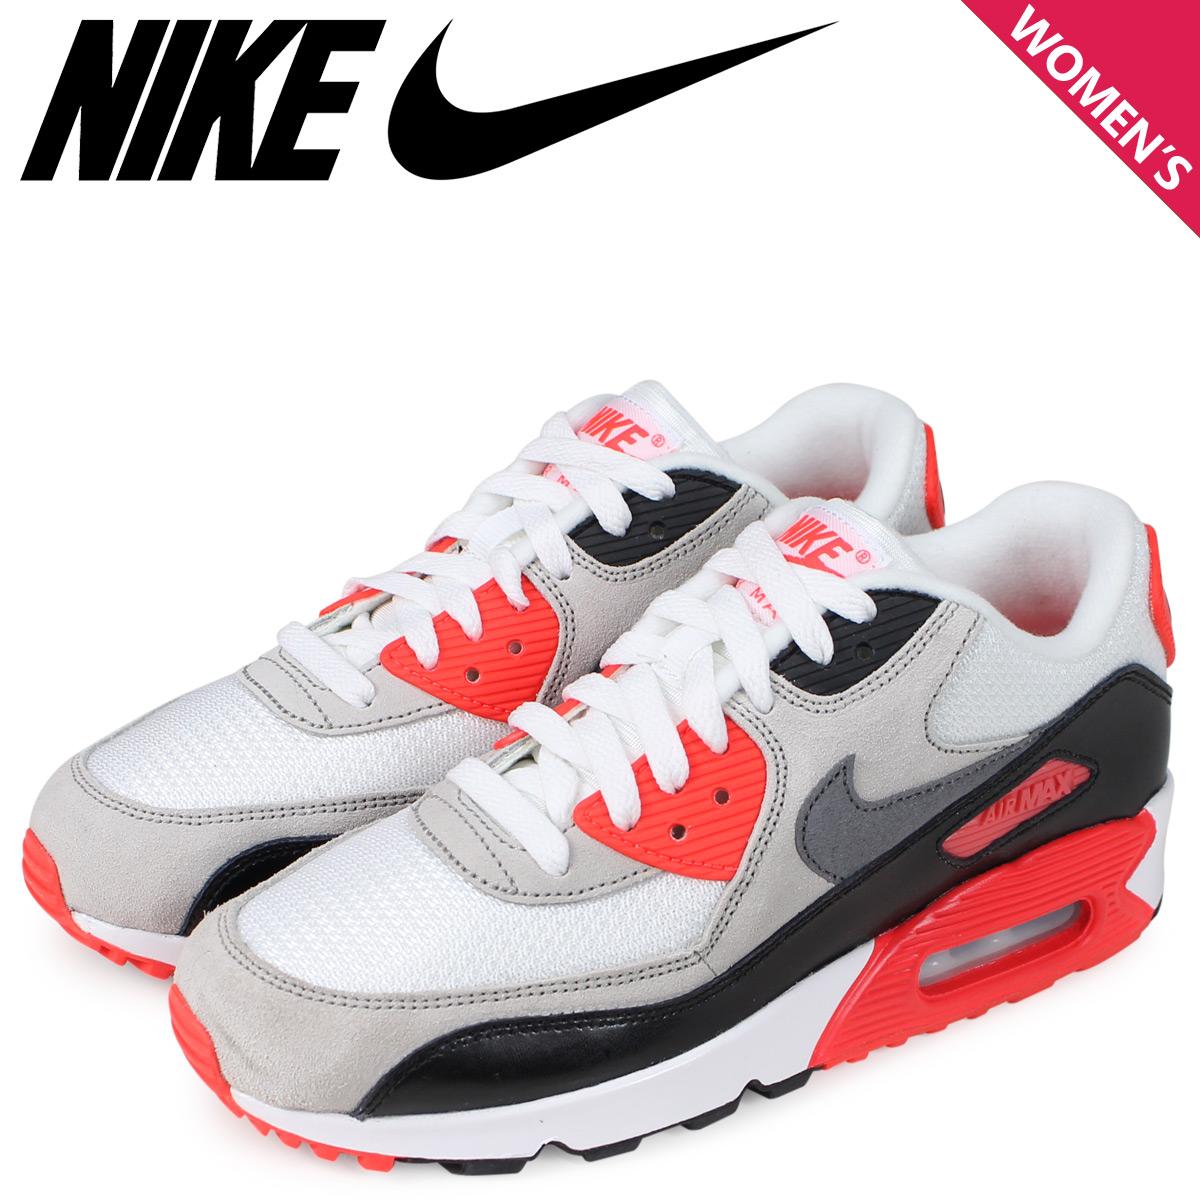 NIKE Kie Ney AMAX 90 Lady's sneakers AIR MAX 90 PREMIUM MESH GS white white 724,882 100